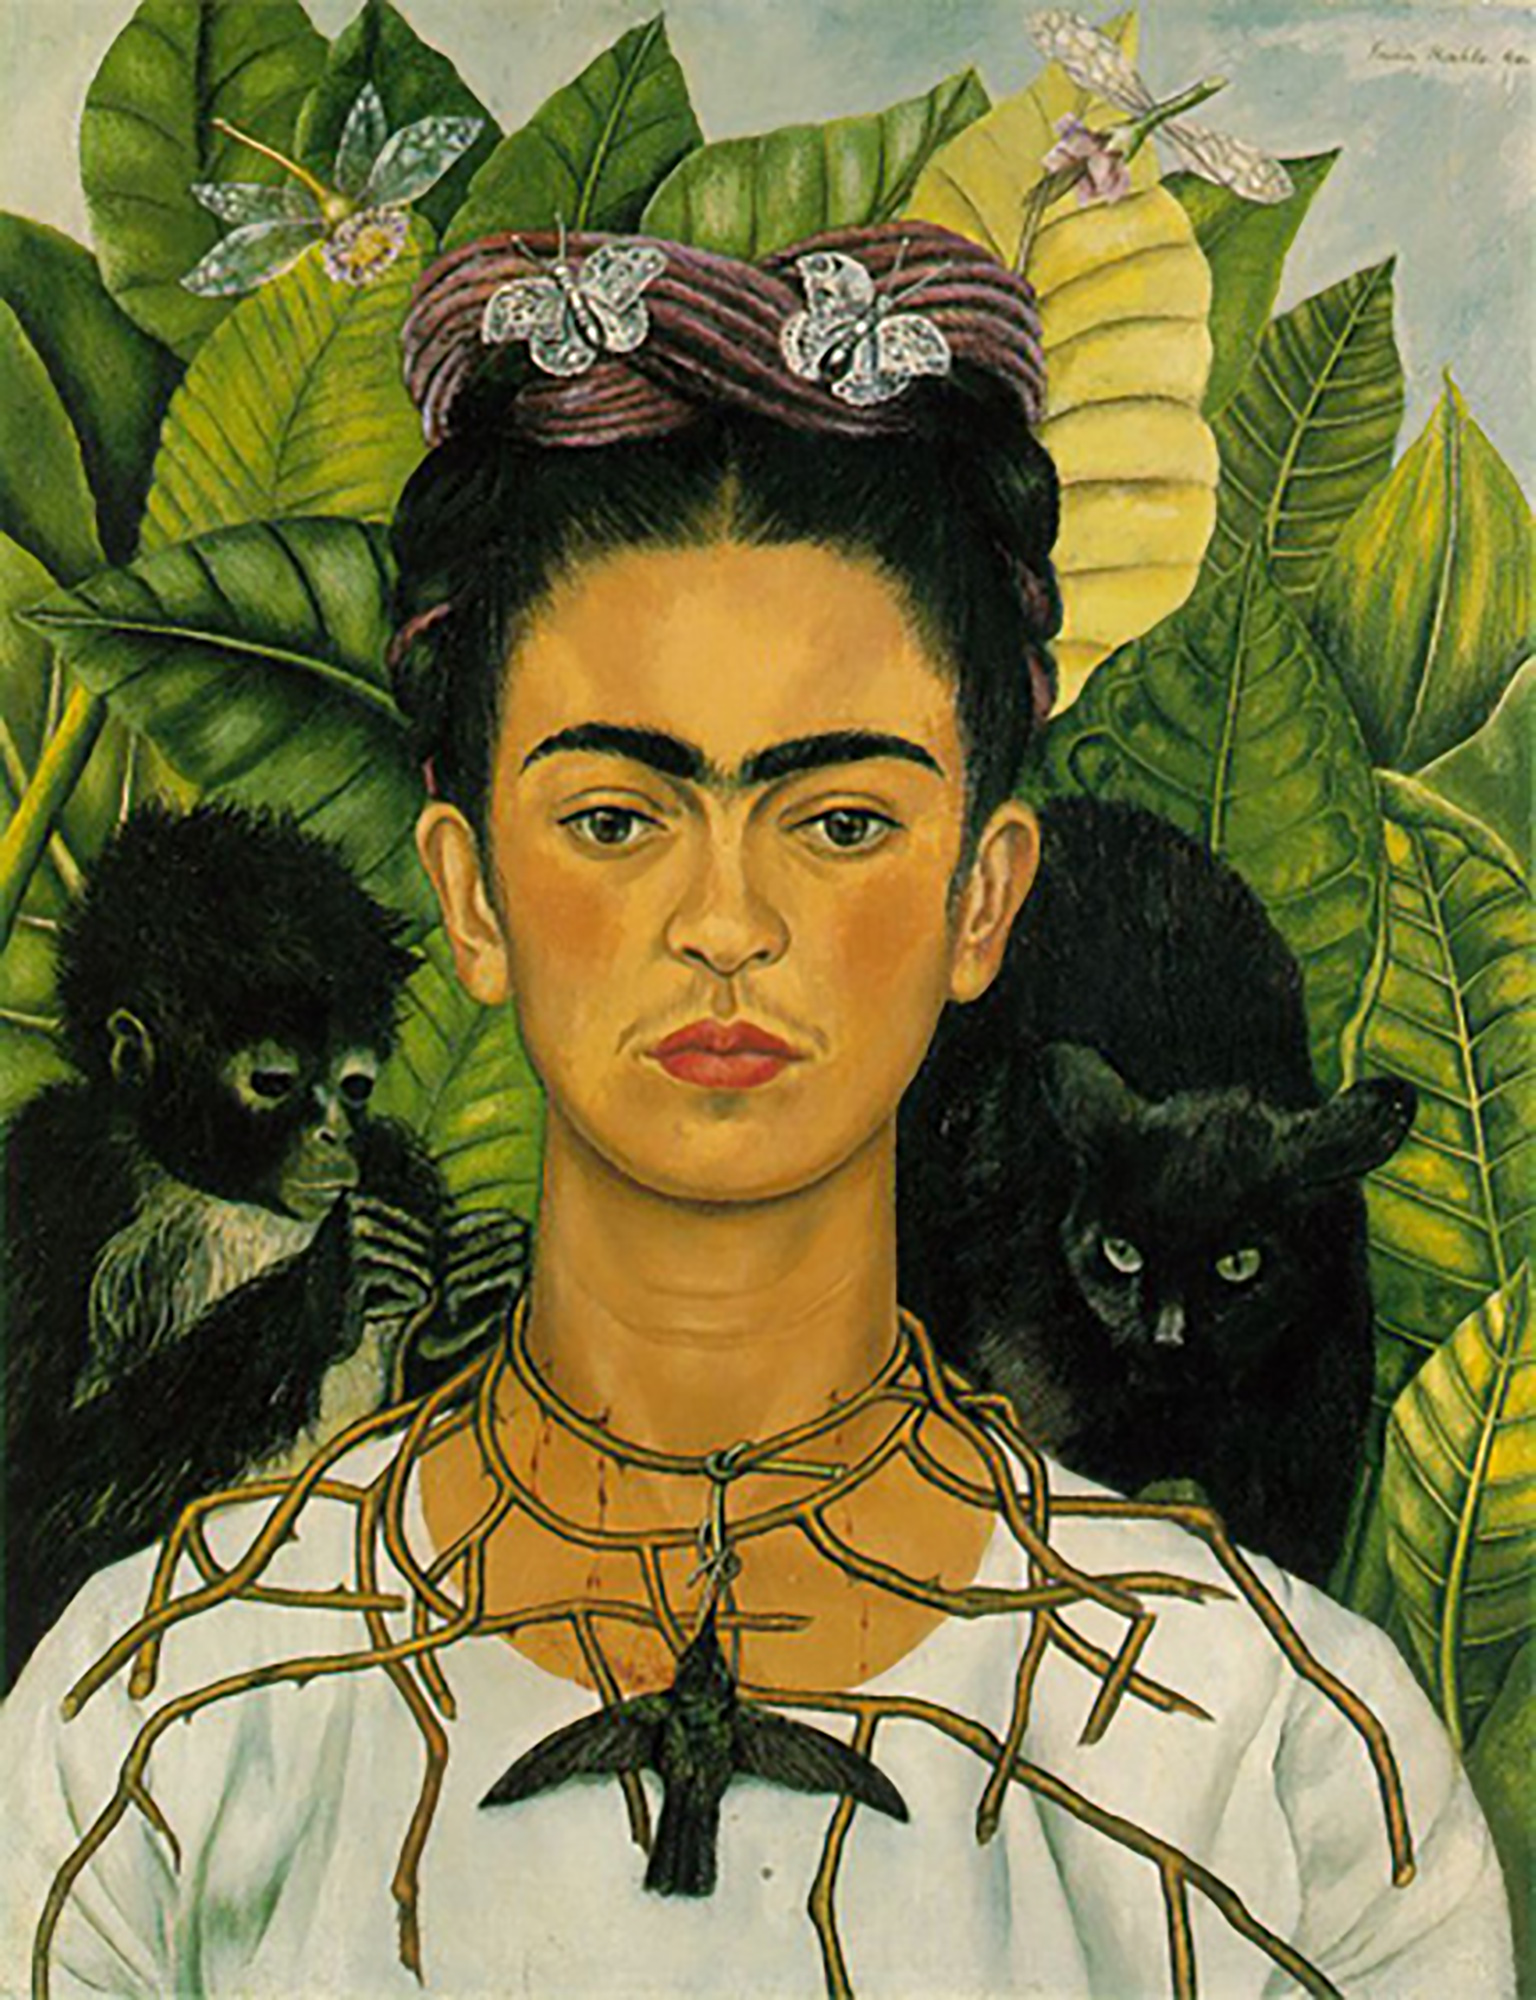 Frida, by Robert Rodriguez